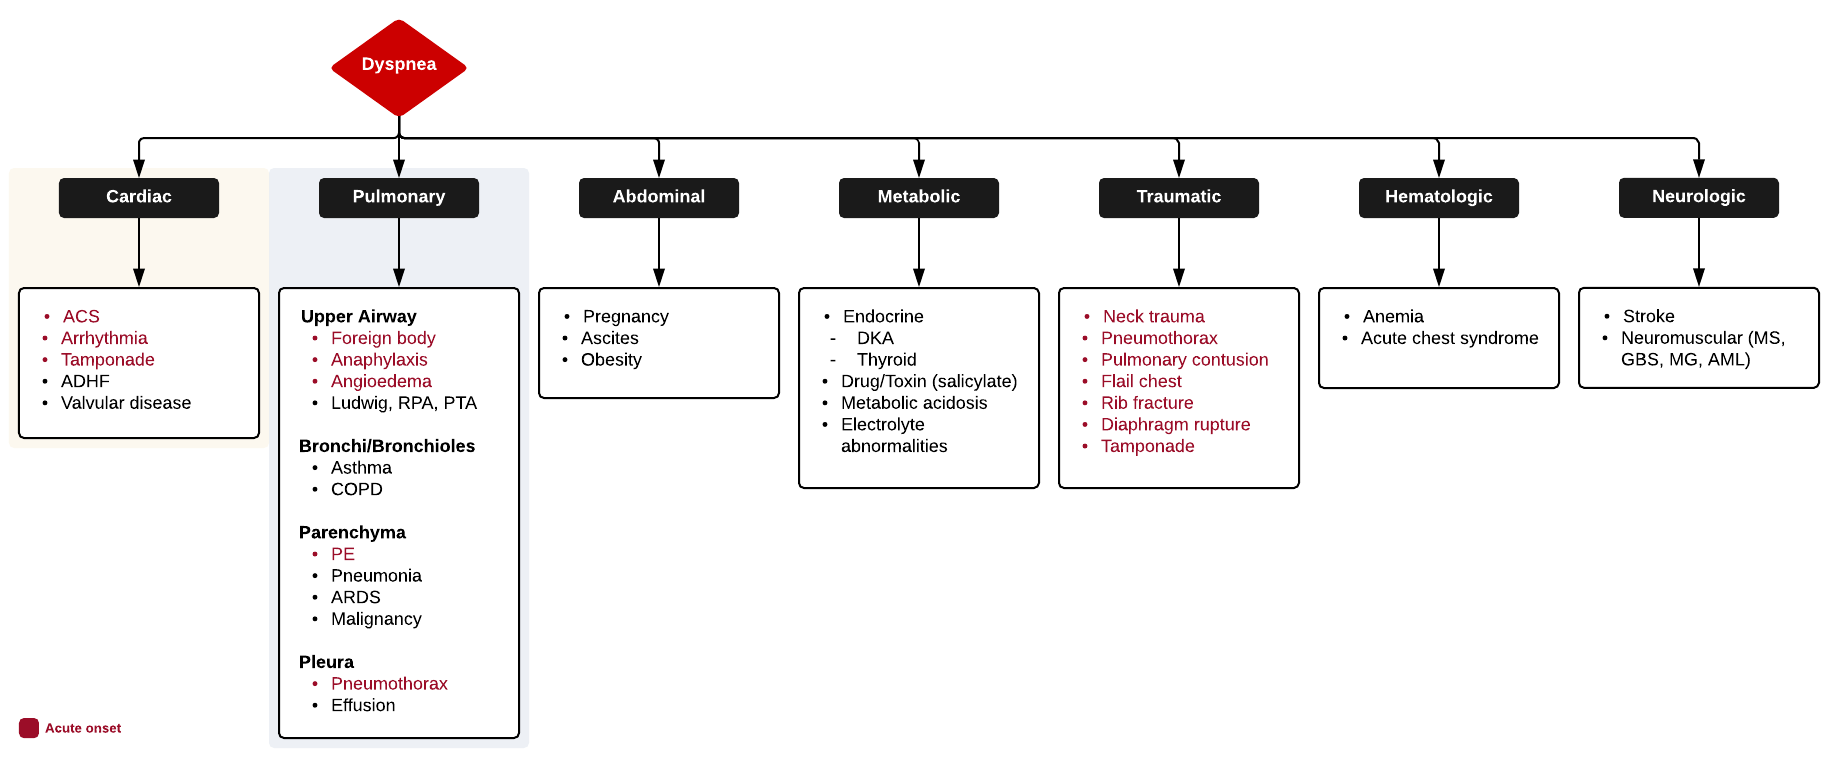 Full ddxof.com article and algorithm on Dyspnea can be found at  https://ddxof.com/dyspnea /